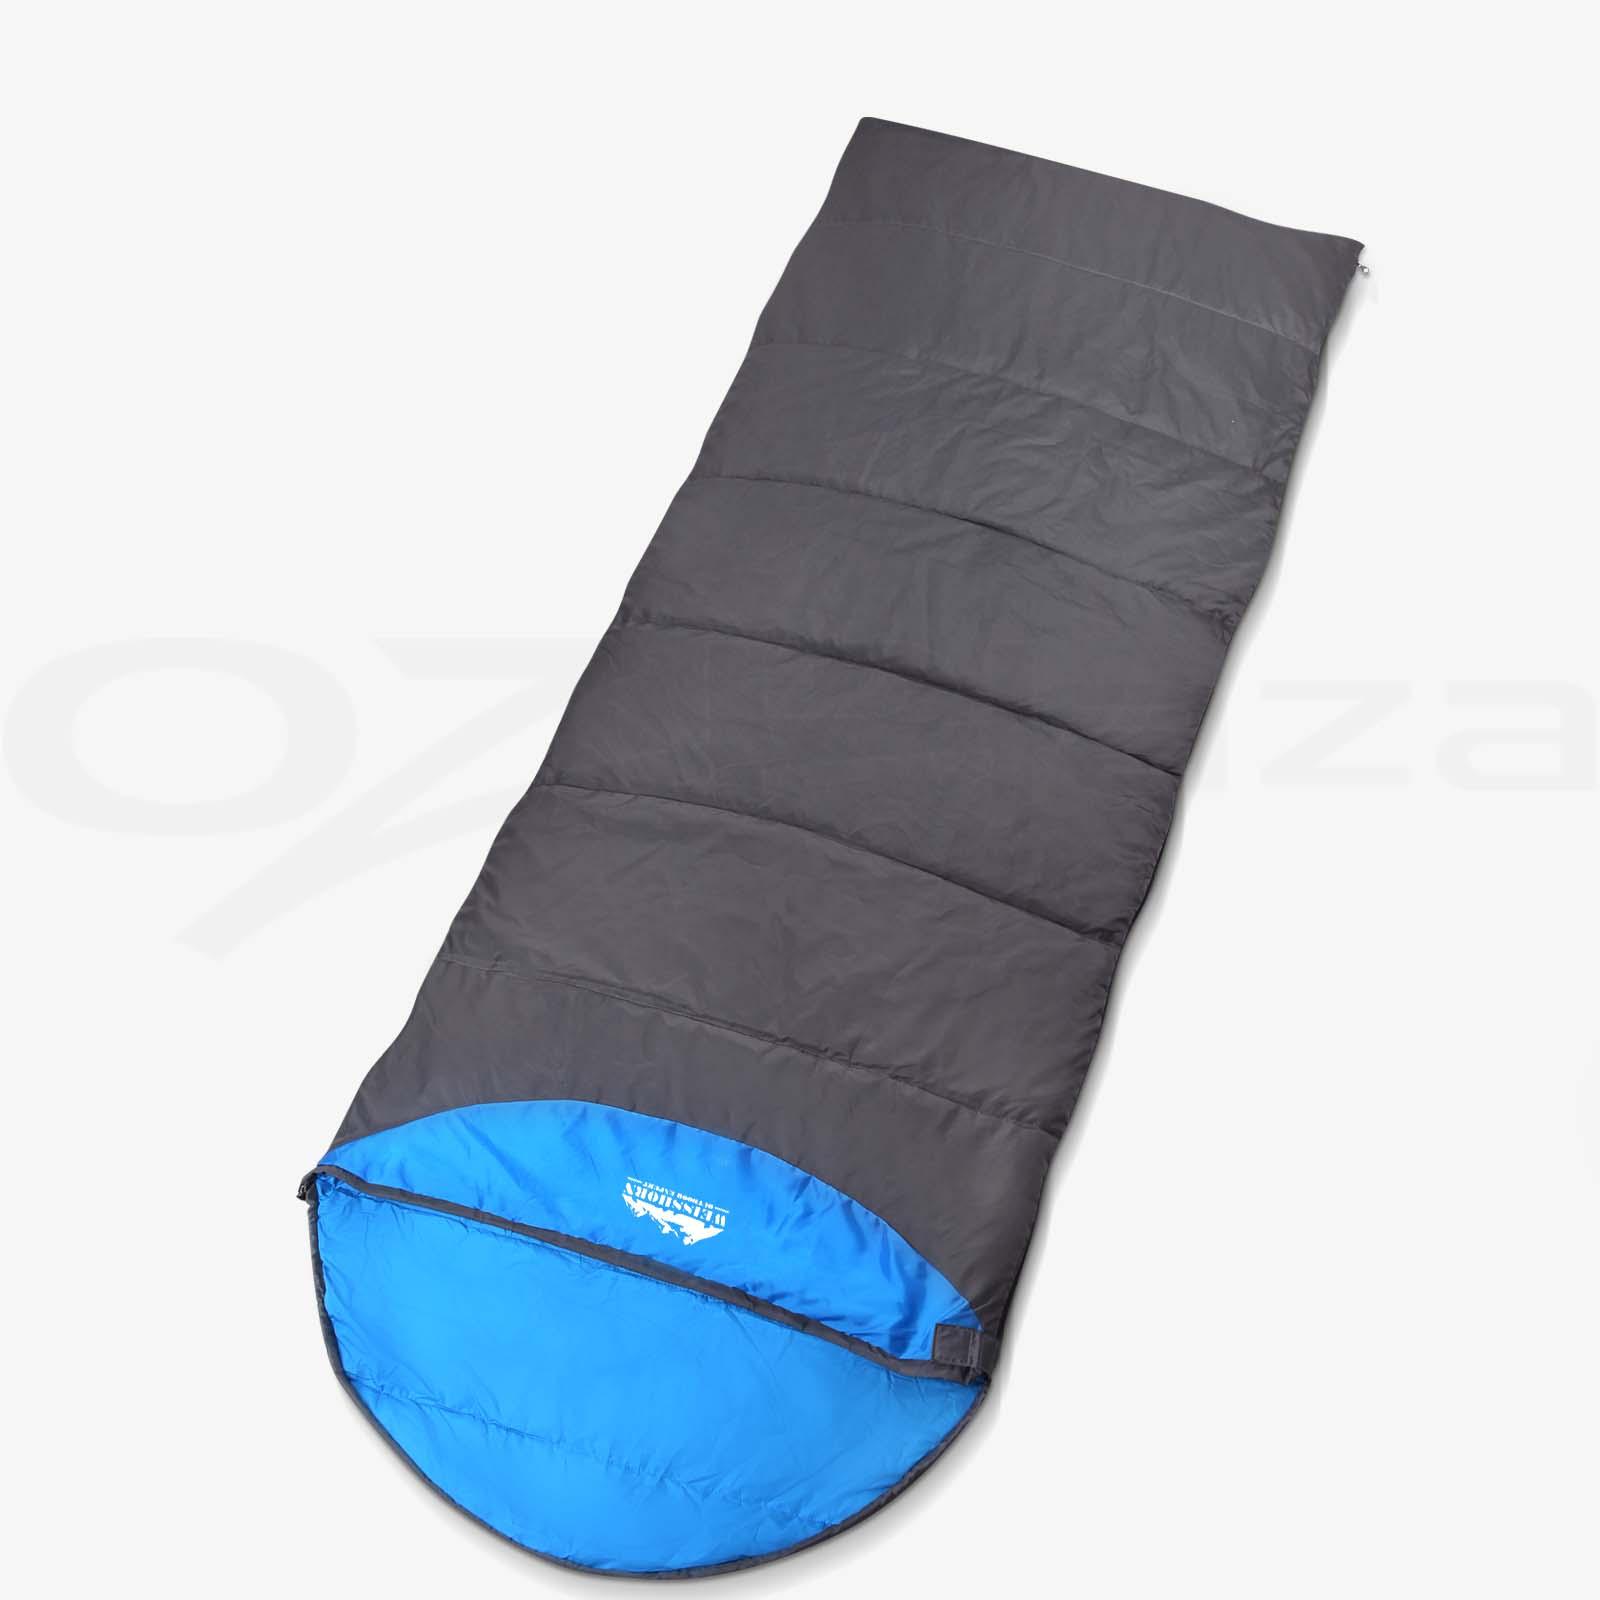 Outdoor Camping Micro Sleeping Bag Compact Thermal Hiking ...